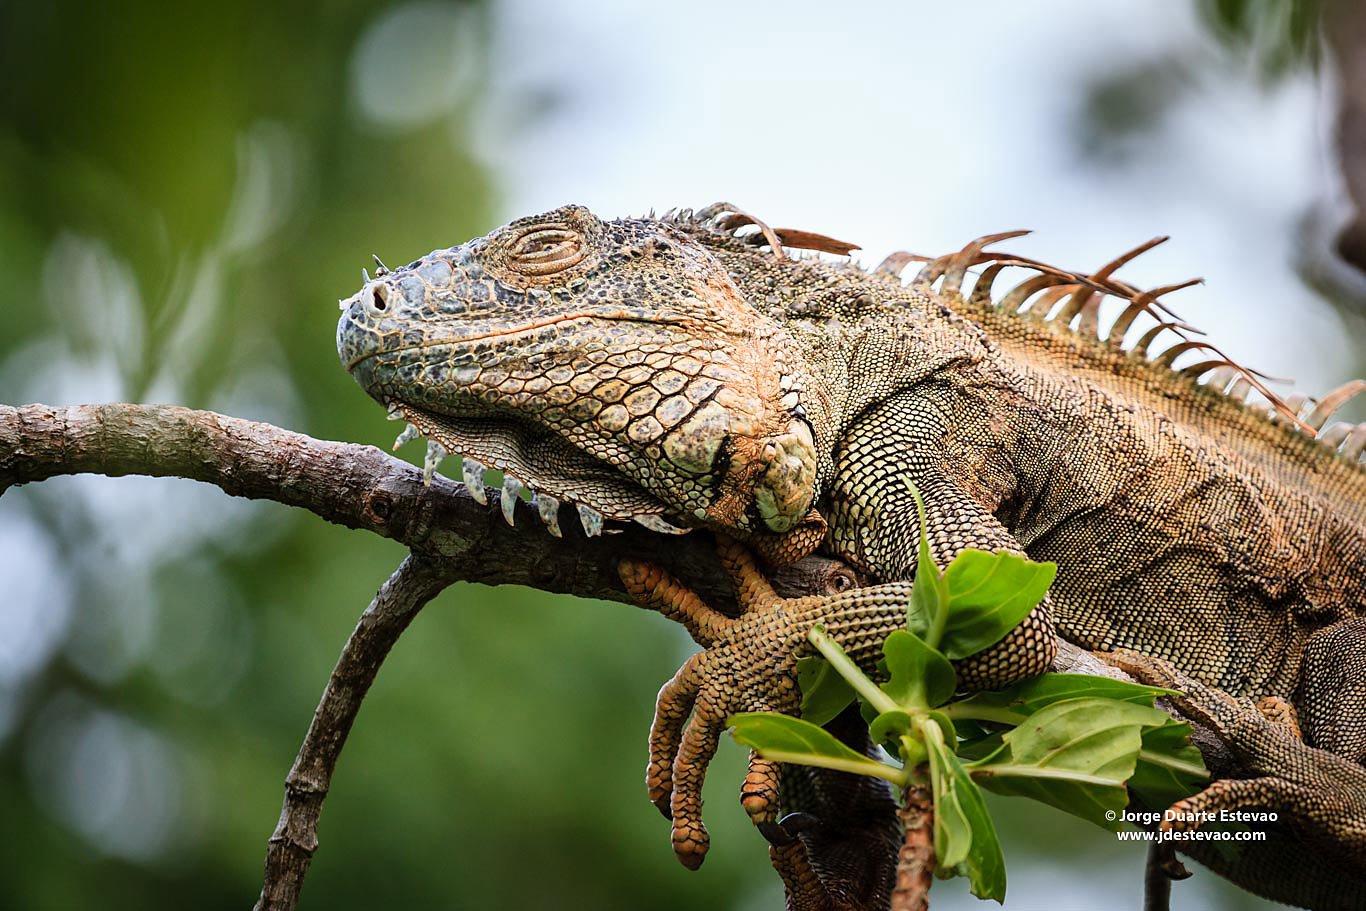 green iguana Tortuguero National Park Costa Rica resting on tree branch